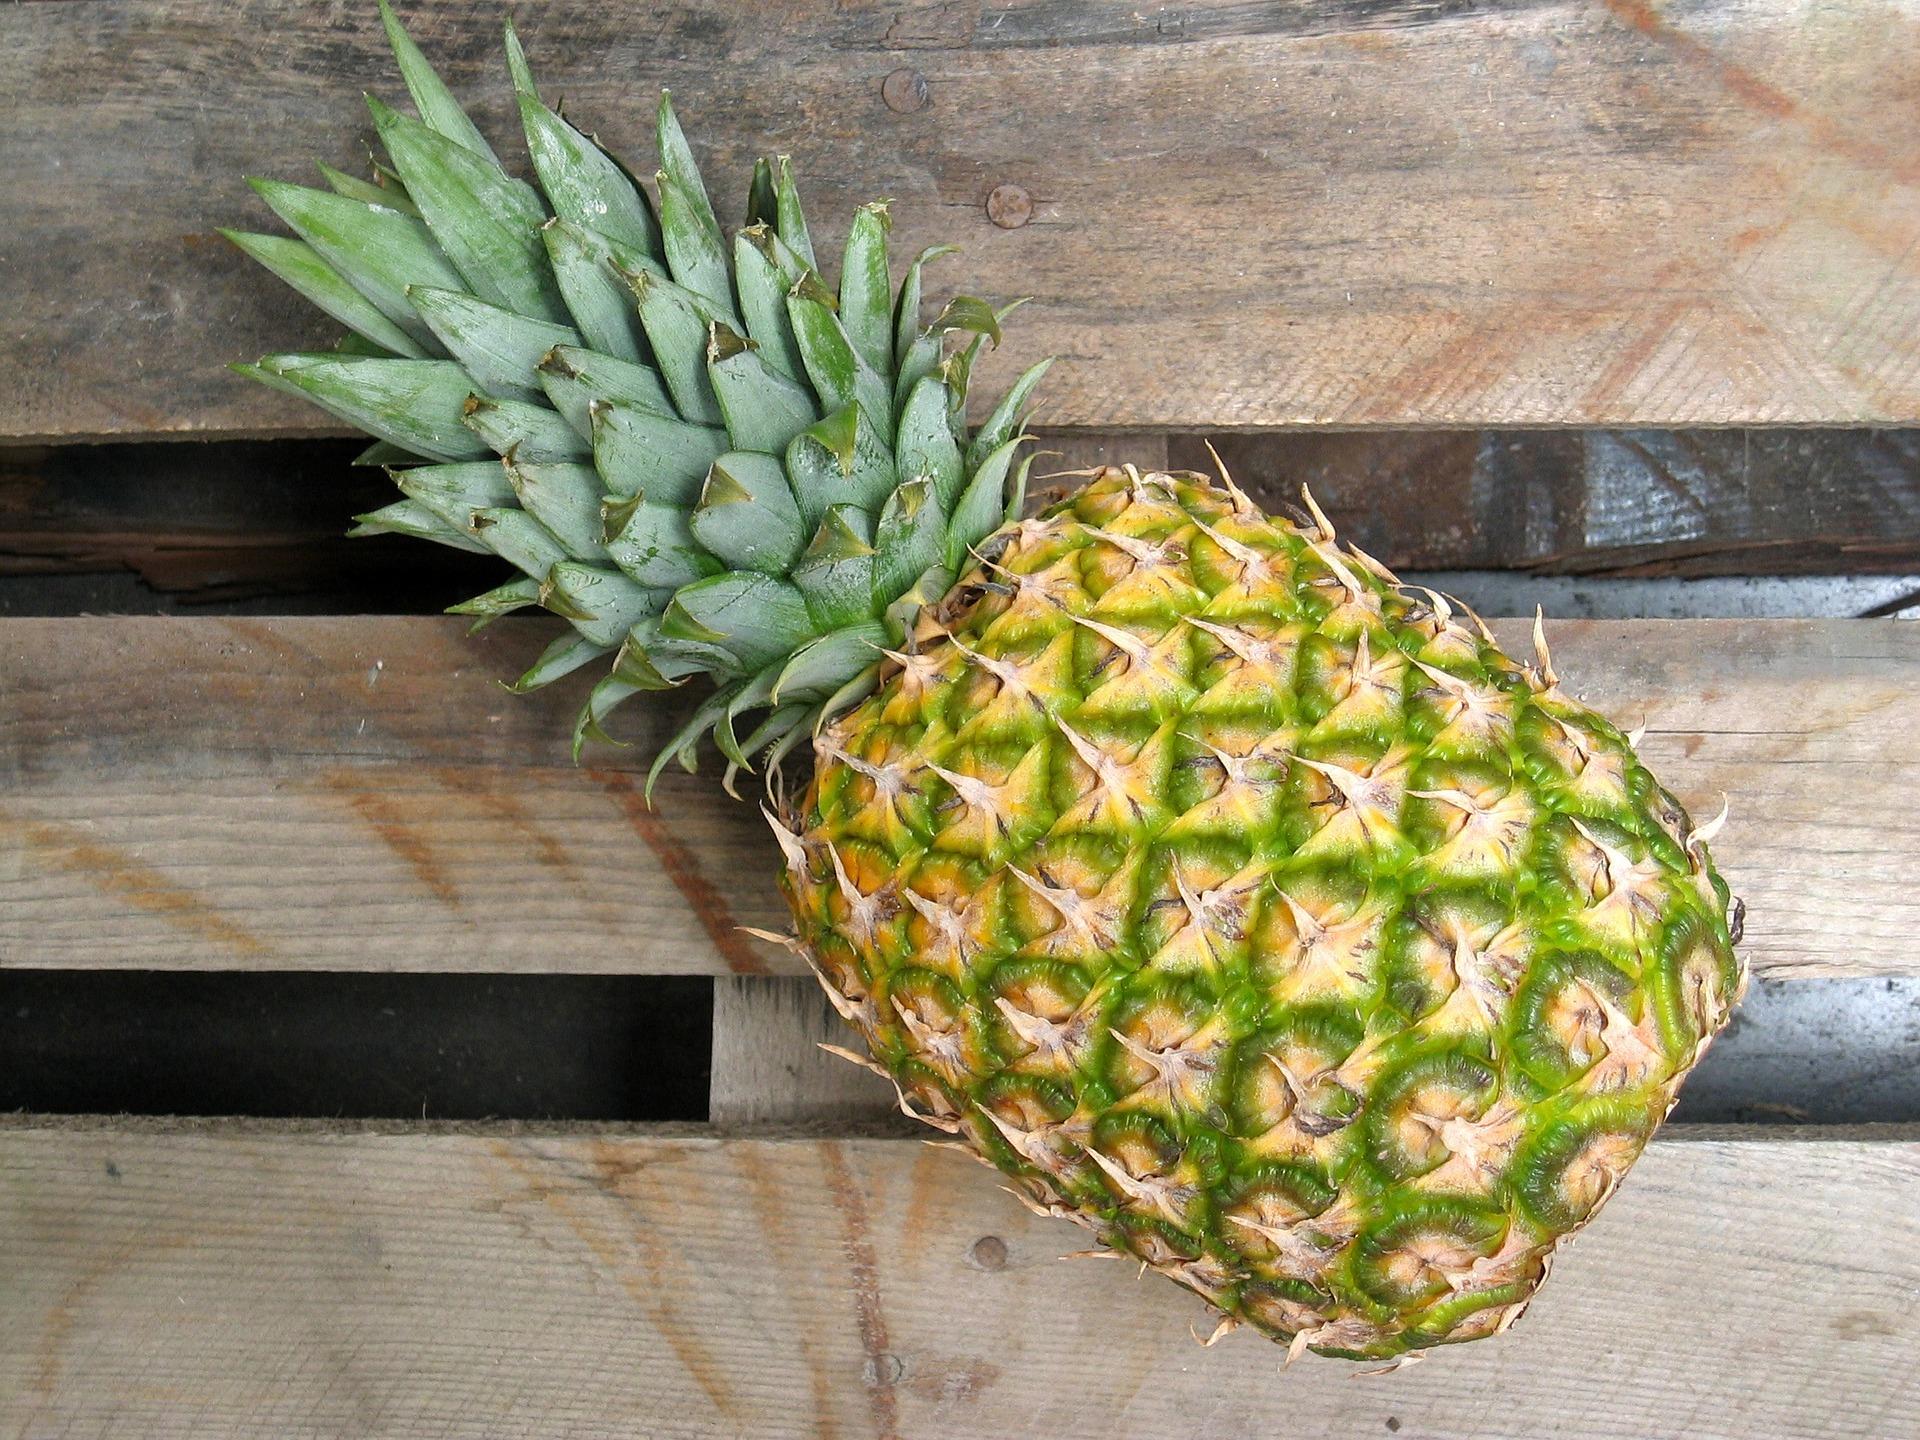 pineapple-642723_1920.jpg